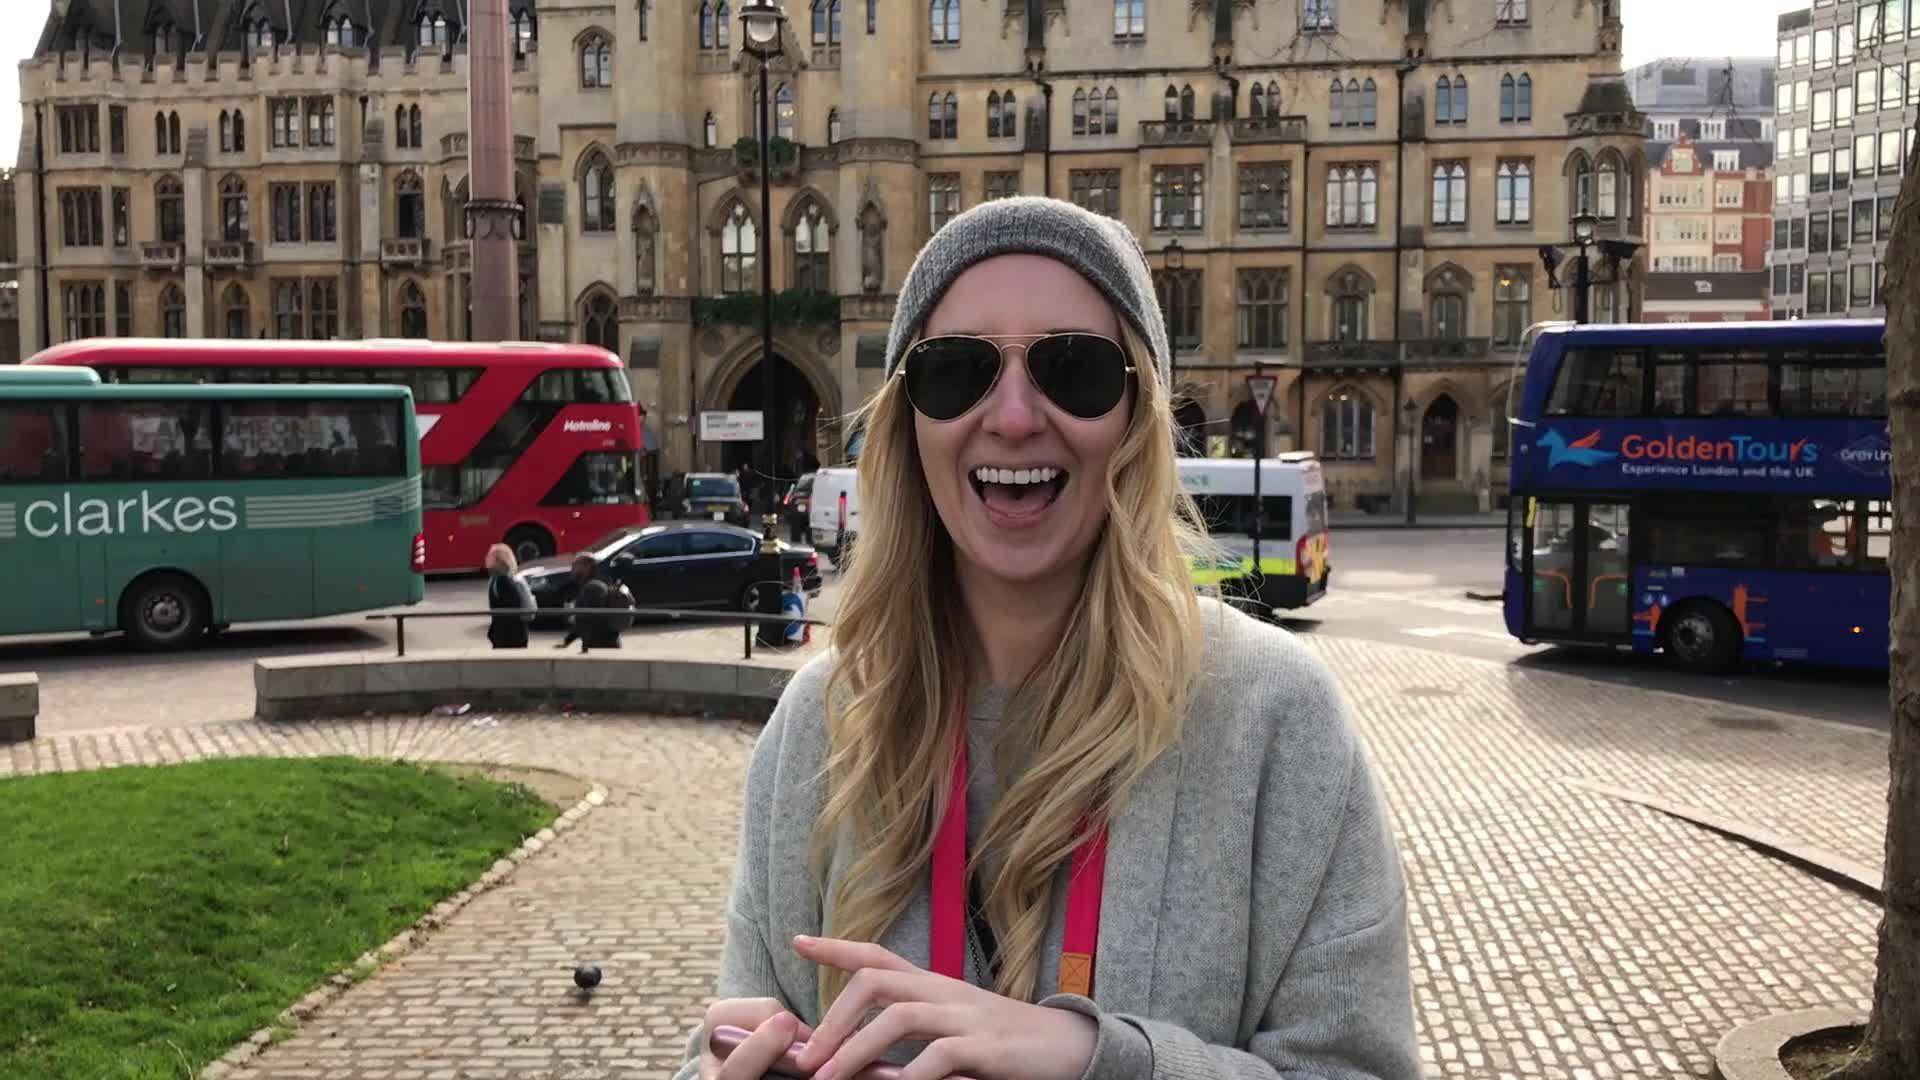 Tales of Emma: London 2017 Geek Travel